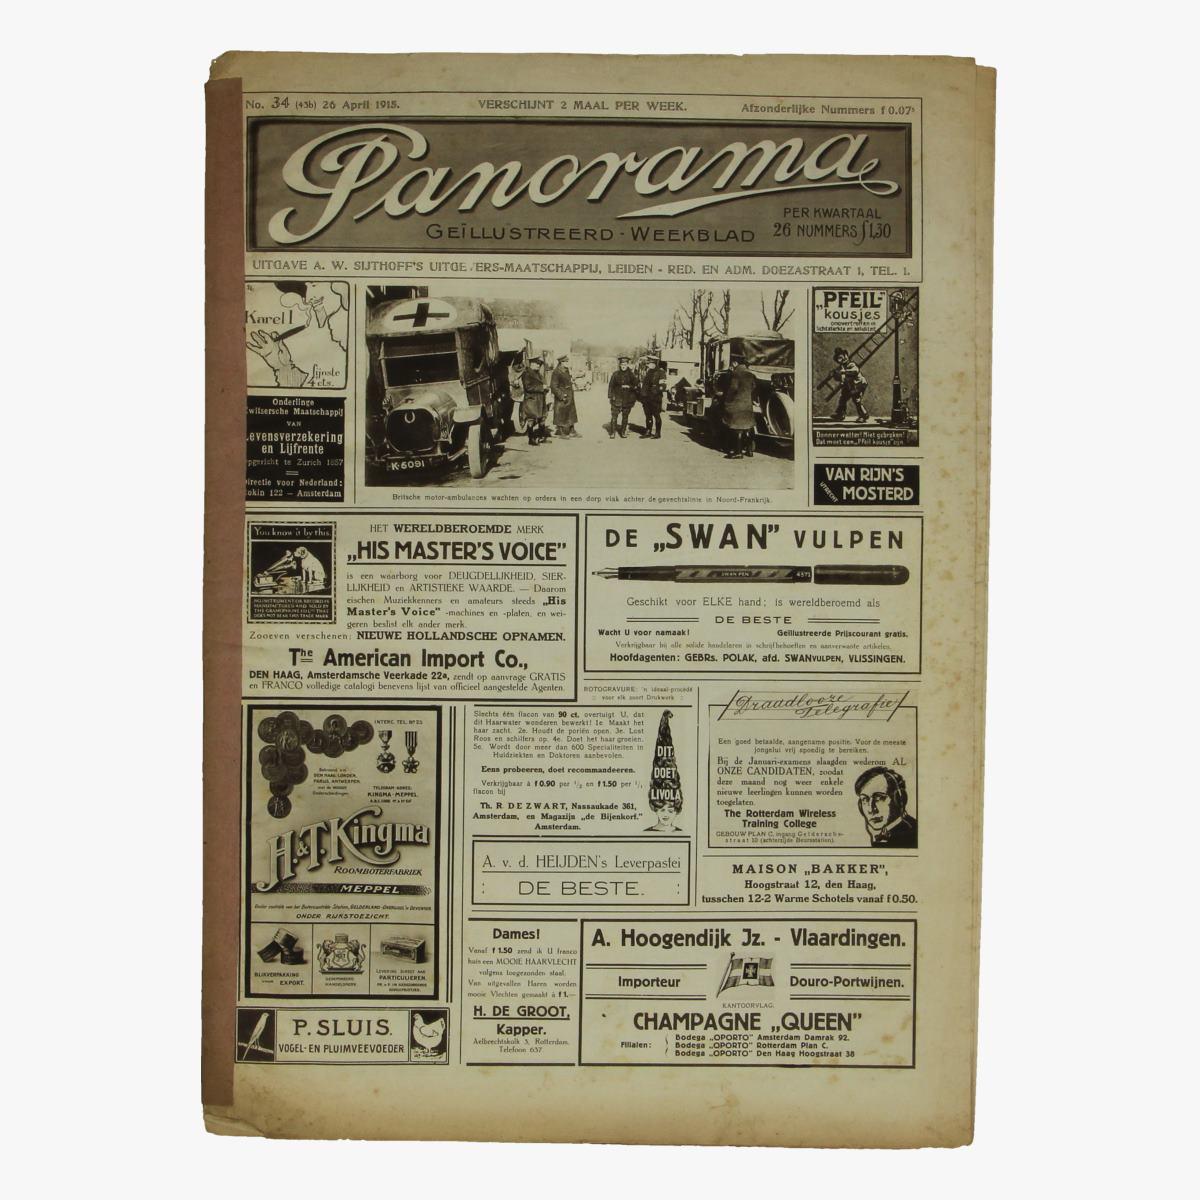 Afbeeldingen van oude weekblad panorama N°34  26 april 1915